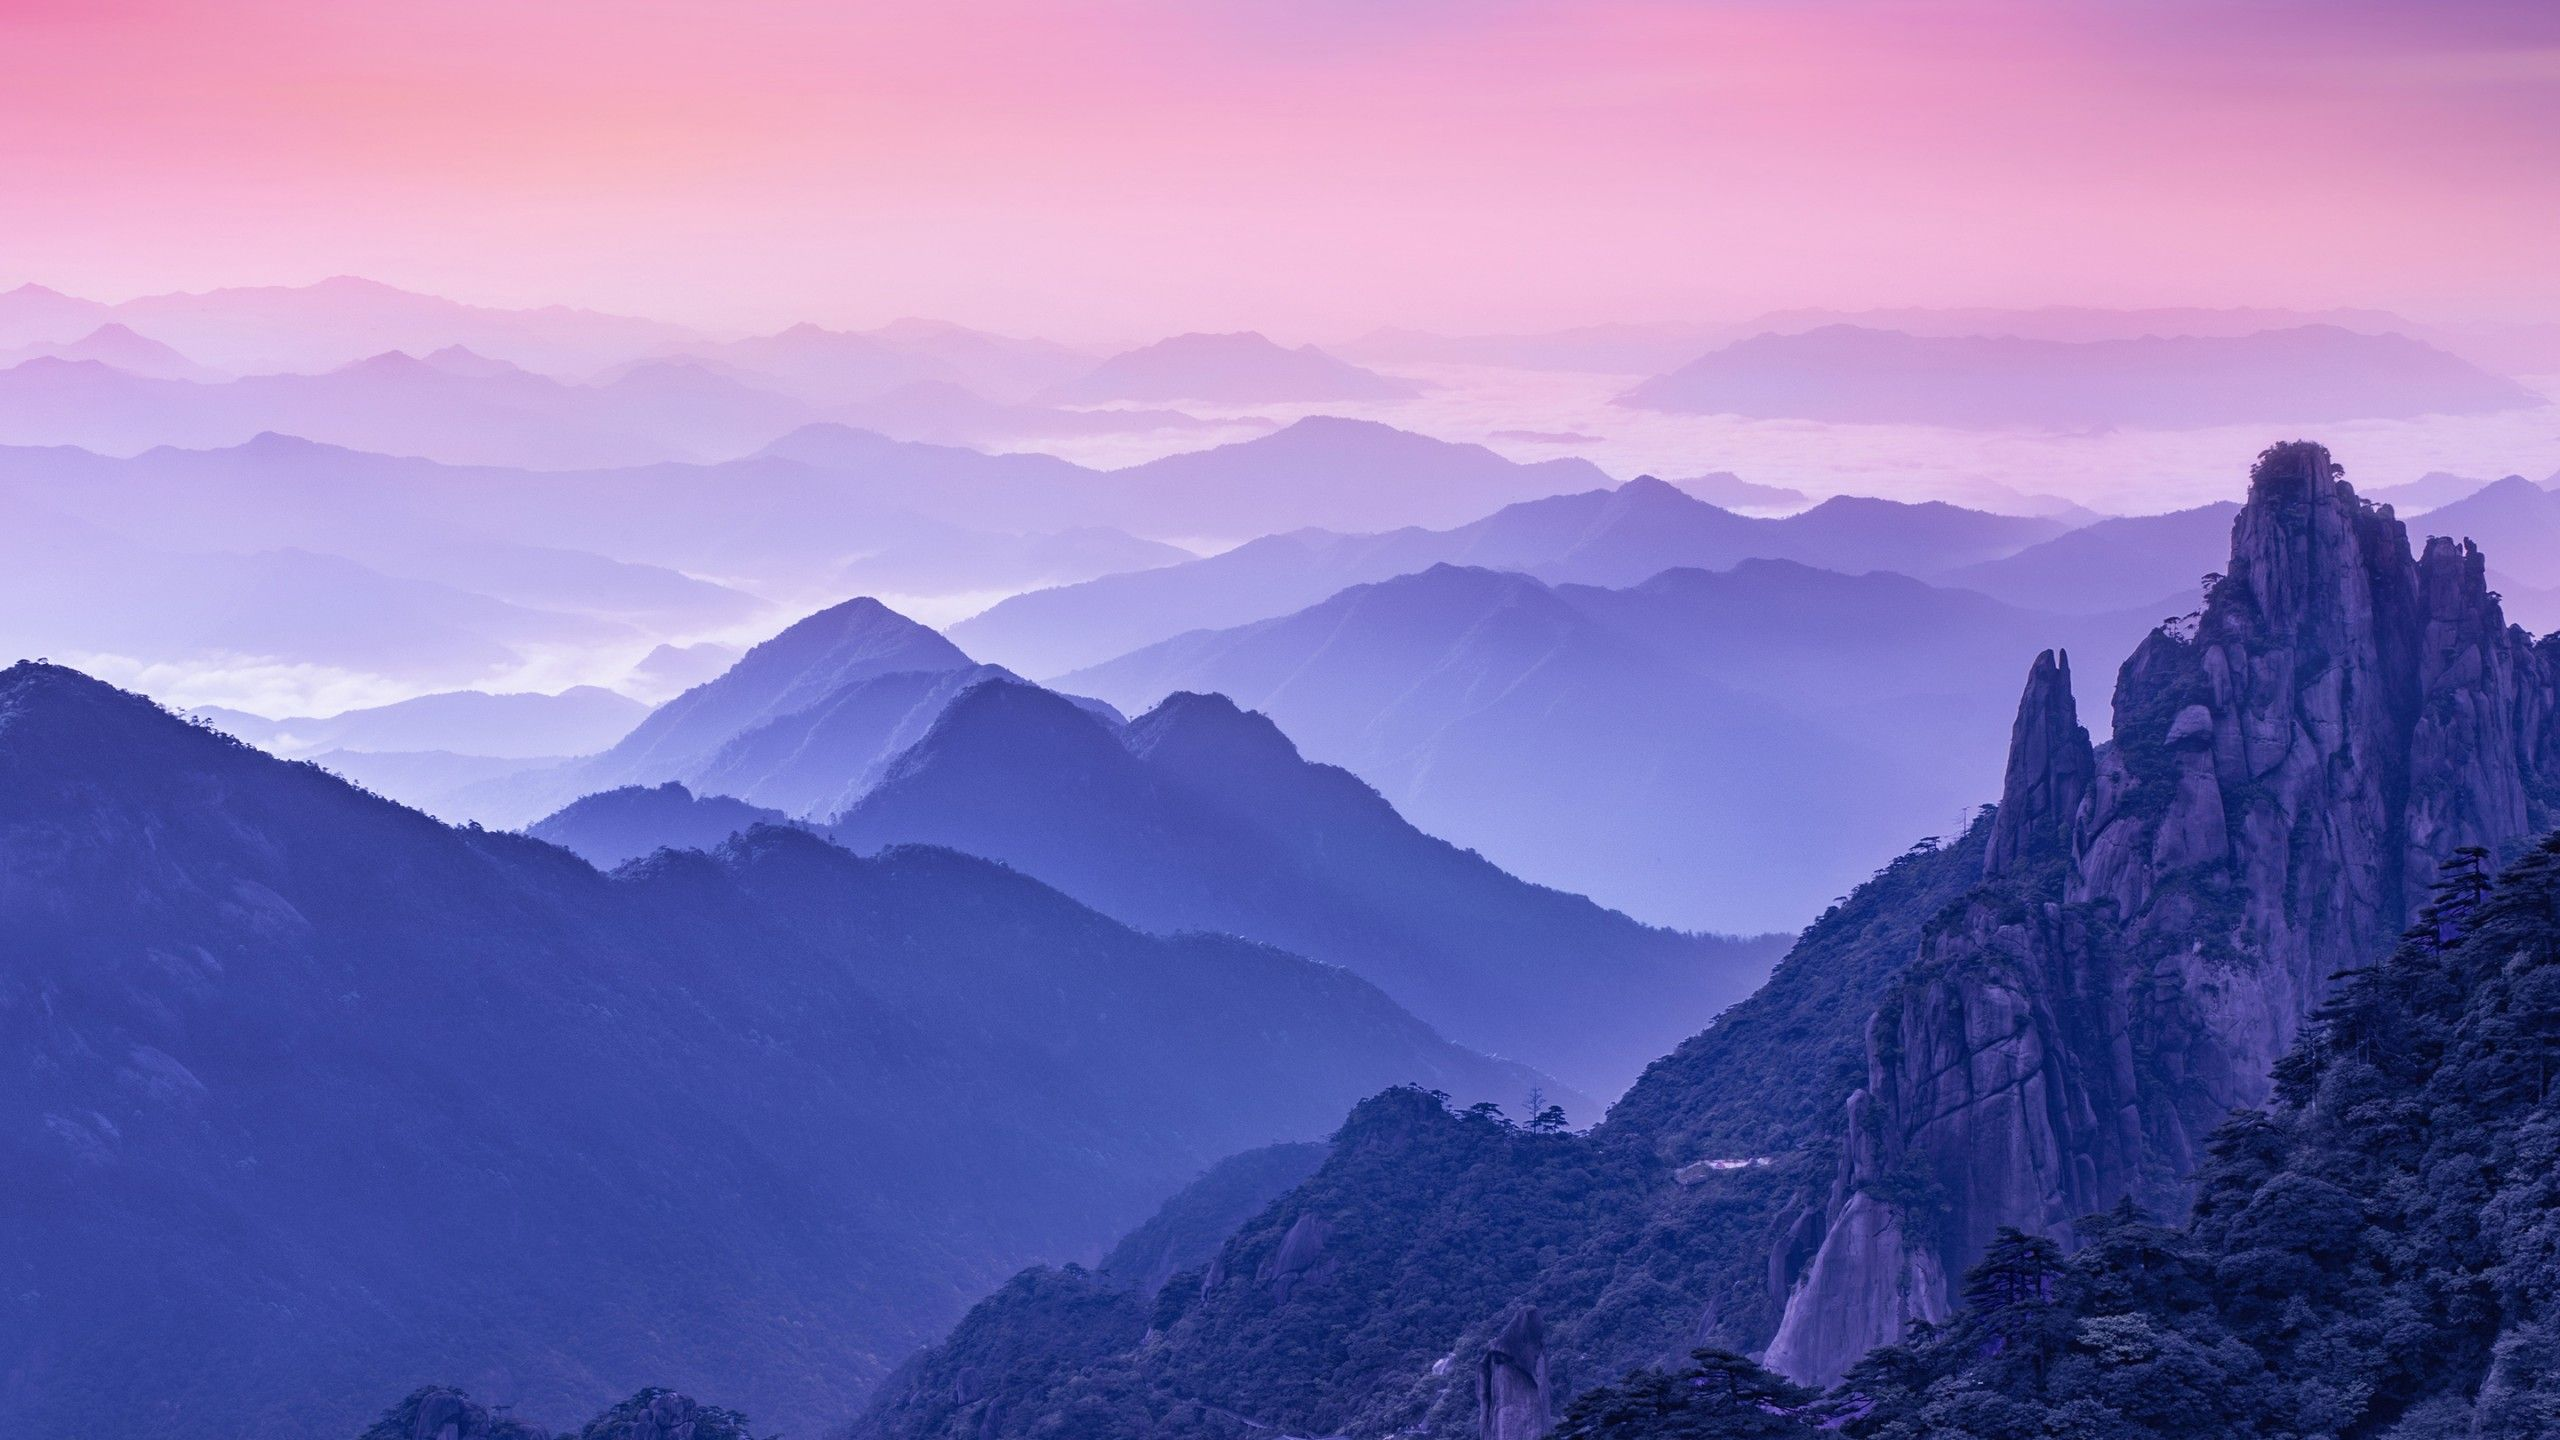 Image Result For Fantasy Mountain Ranges Mountain Wallpaper